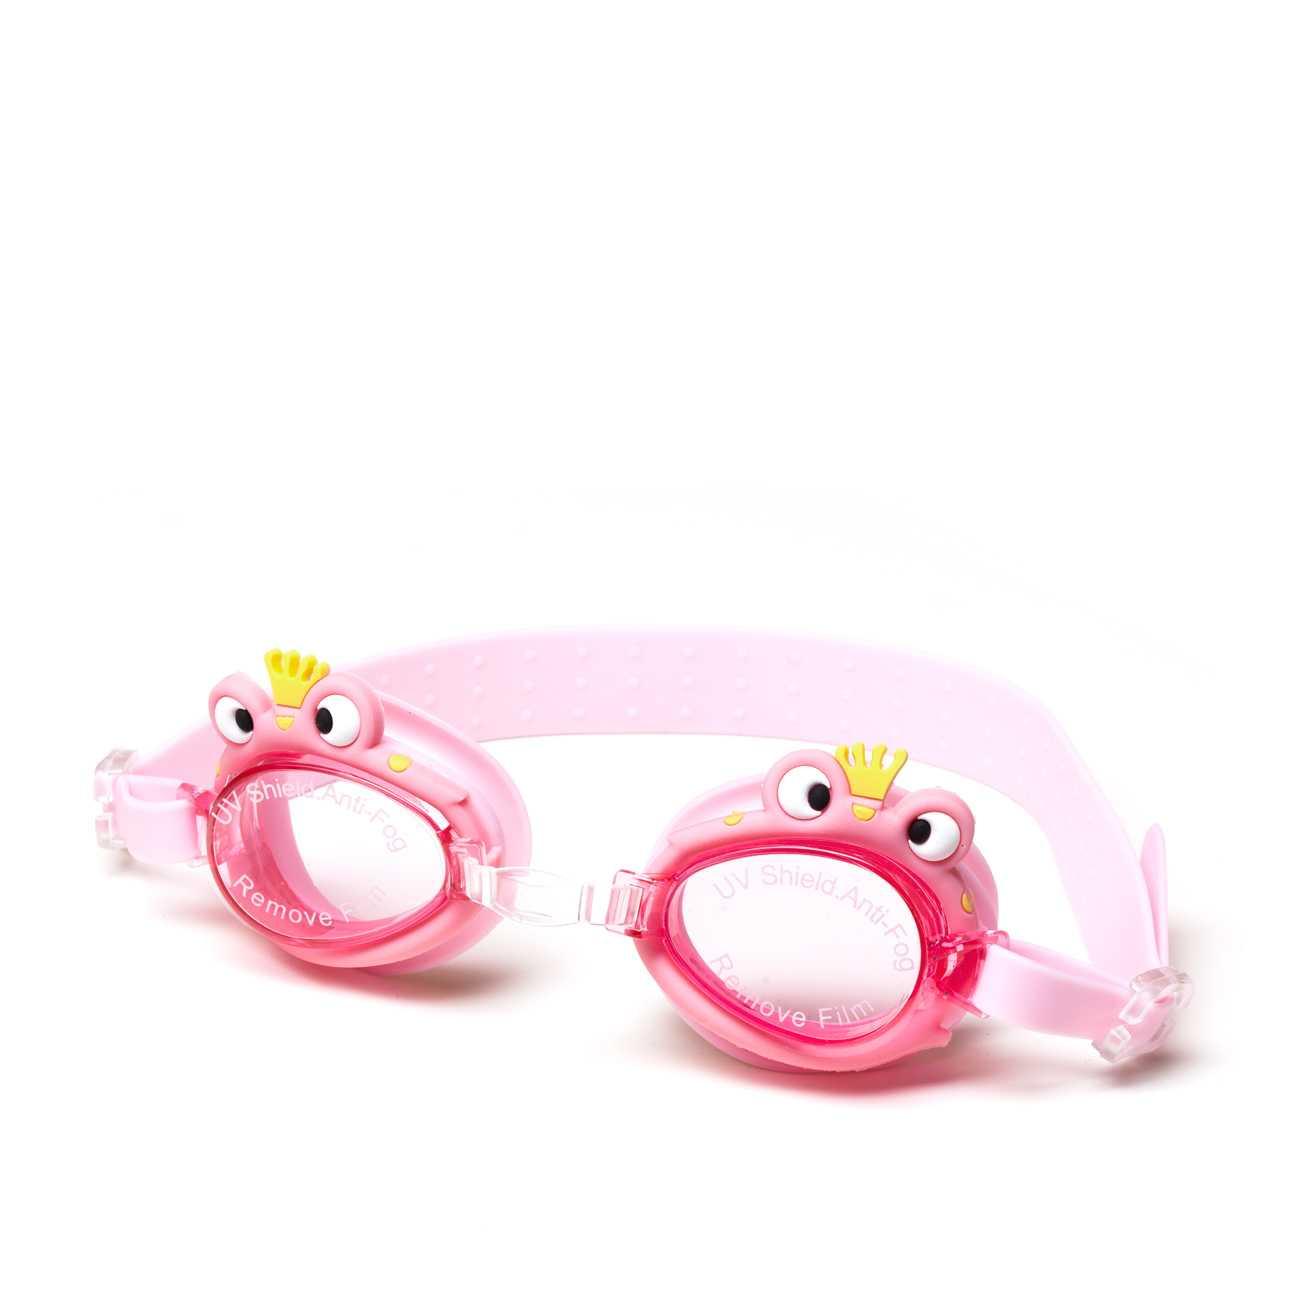 Swimming Goggles Pink imagine